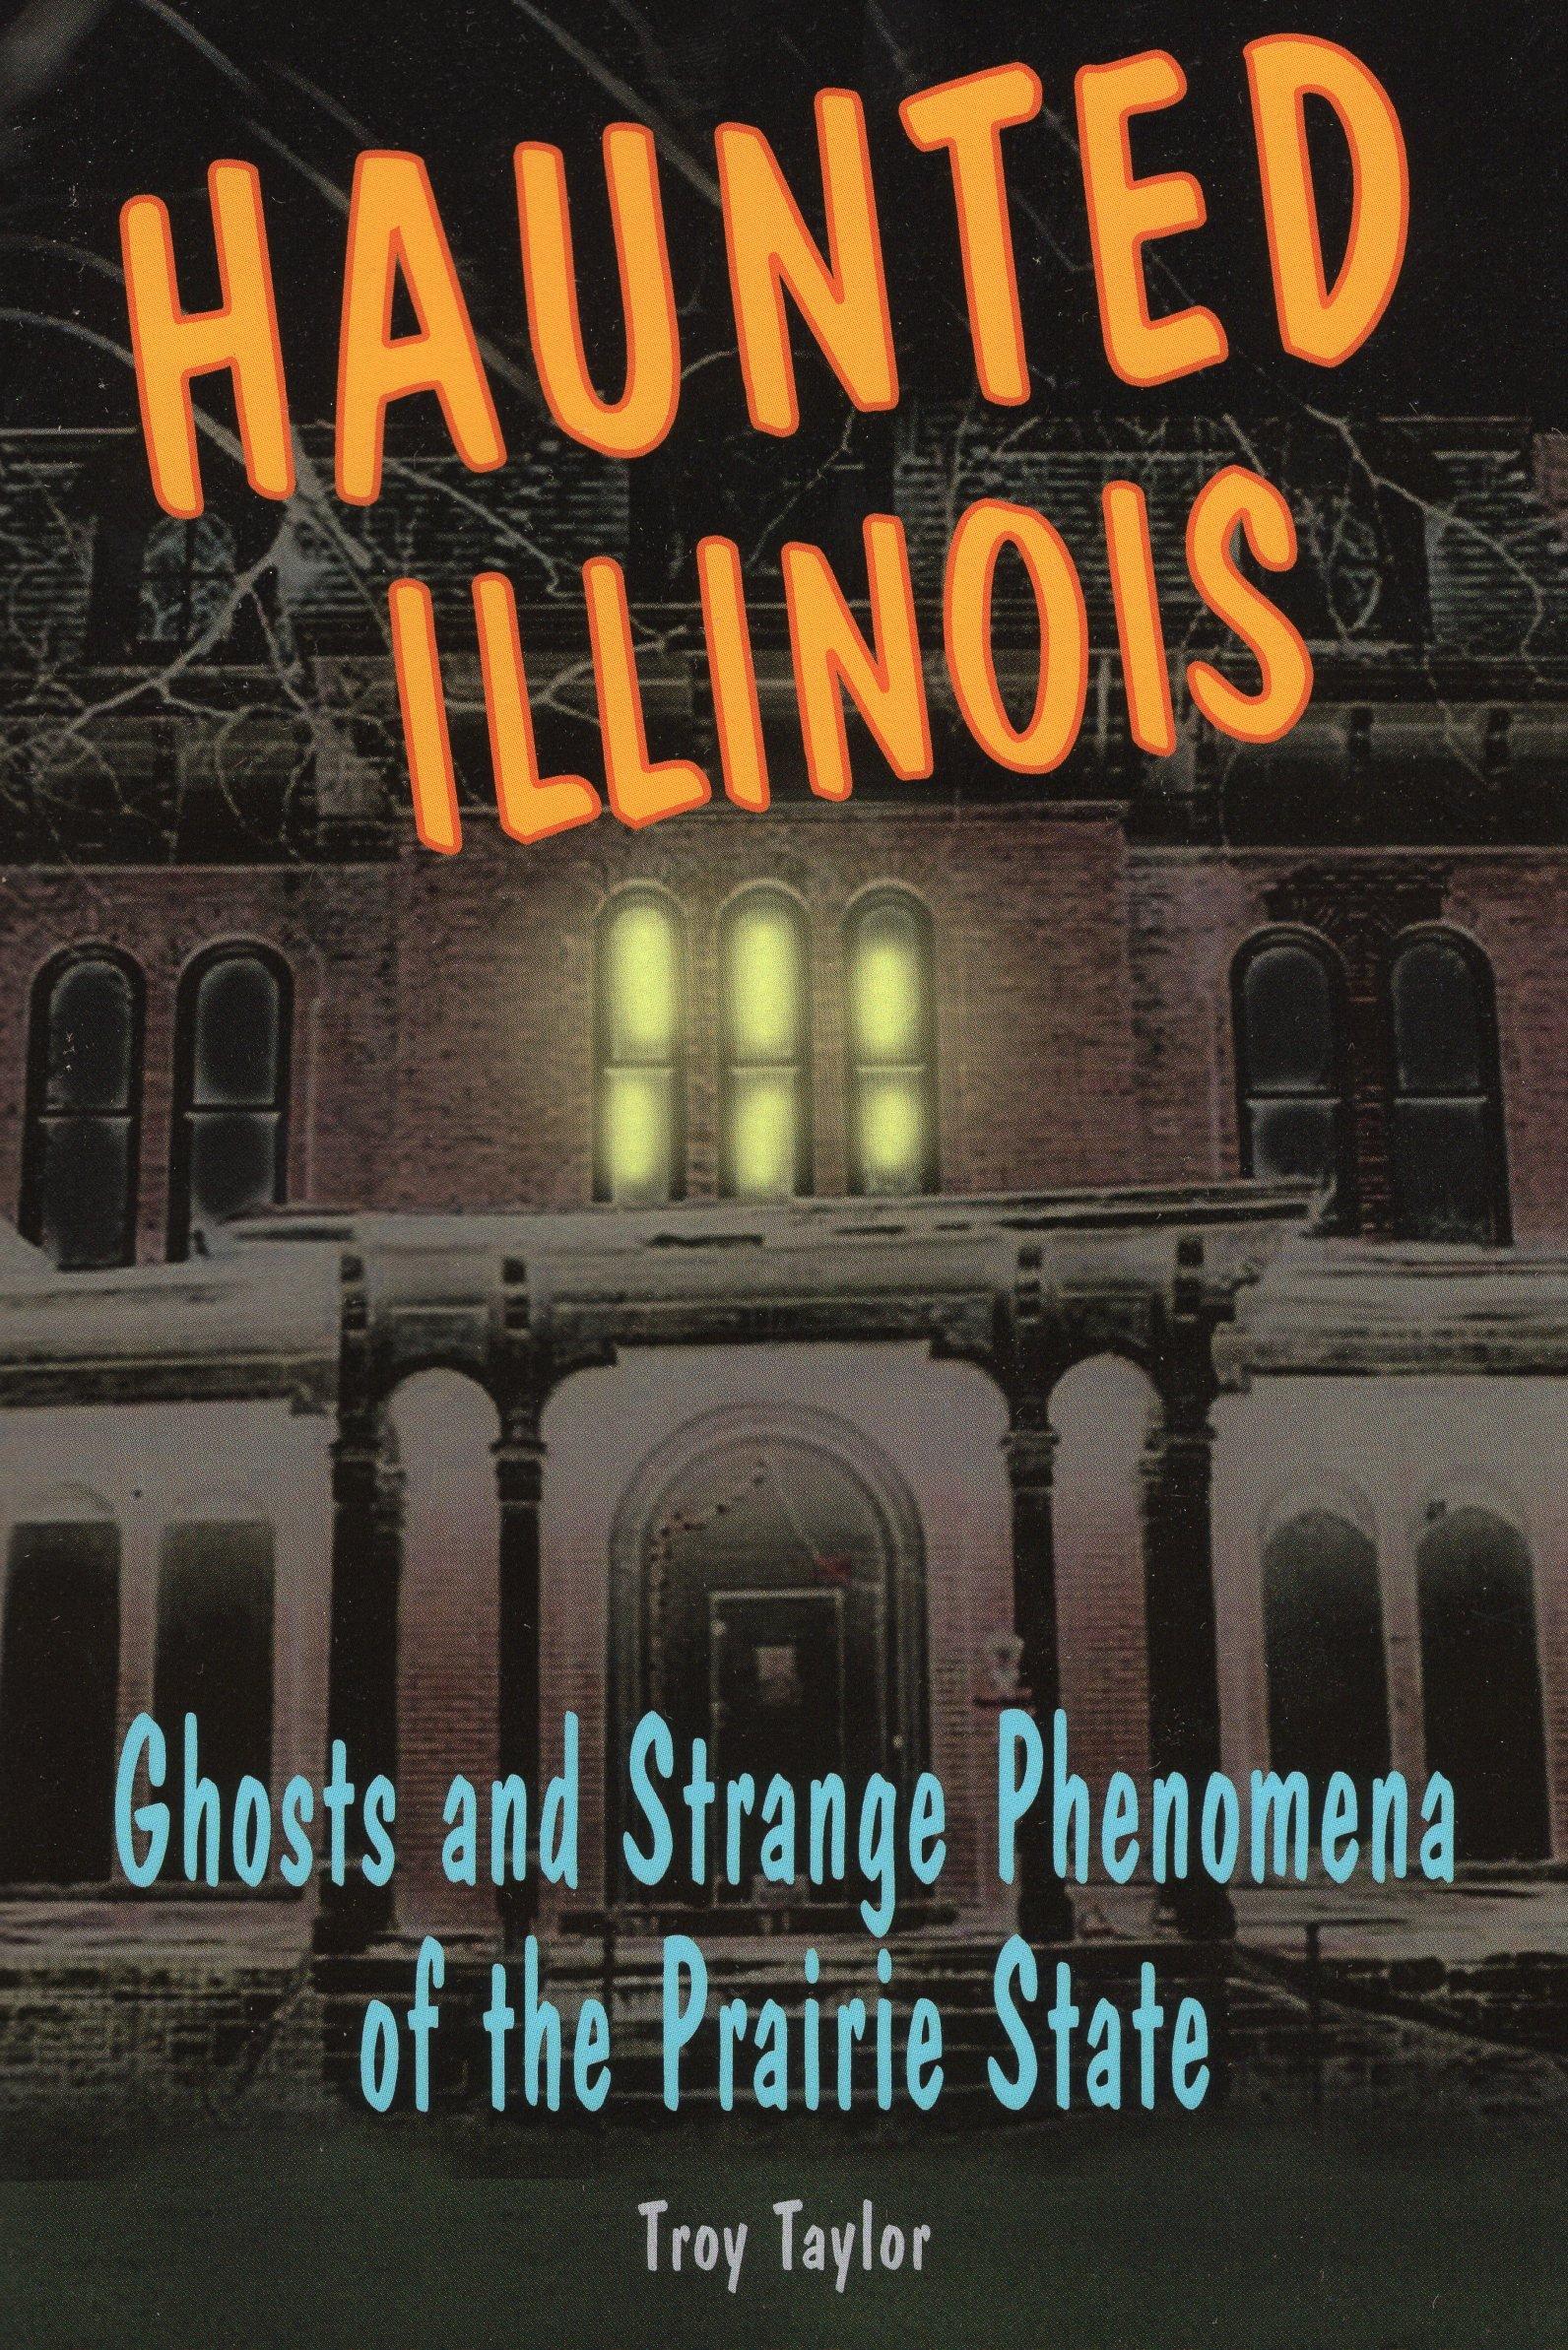 Haunted Illinois: Ghosts and Strange Phenomena of the Prairie State (Haunted Series) pdf epub